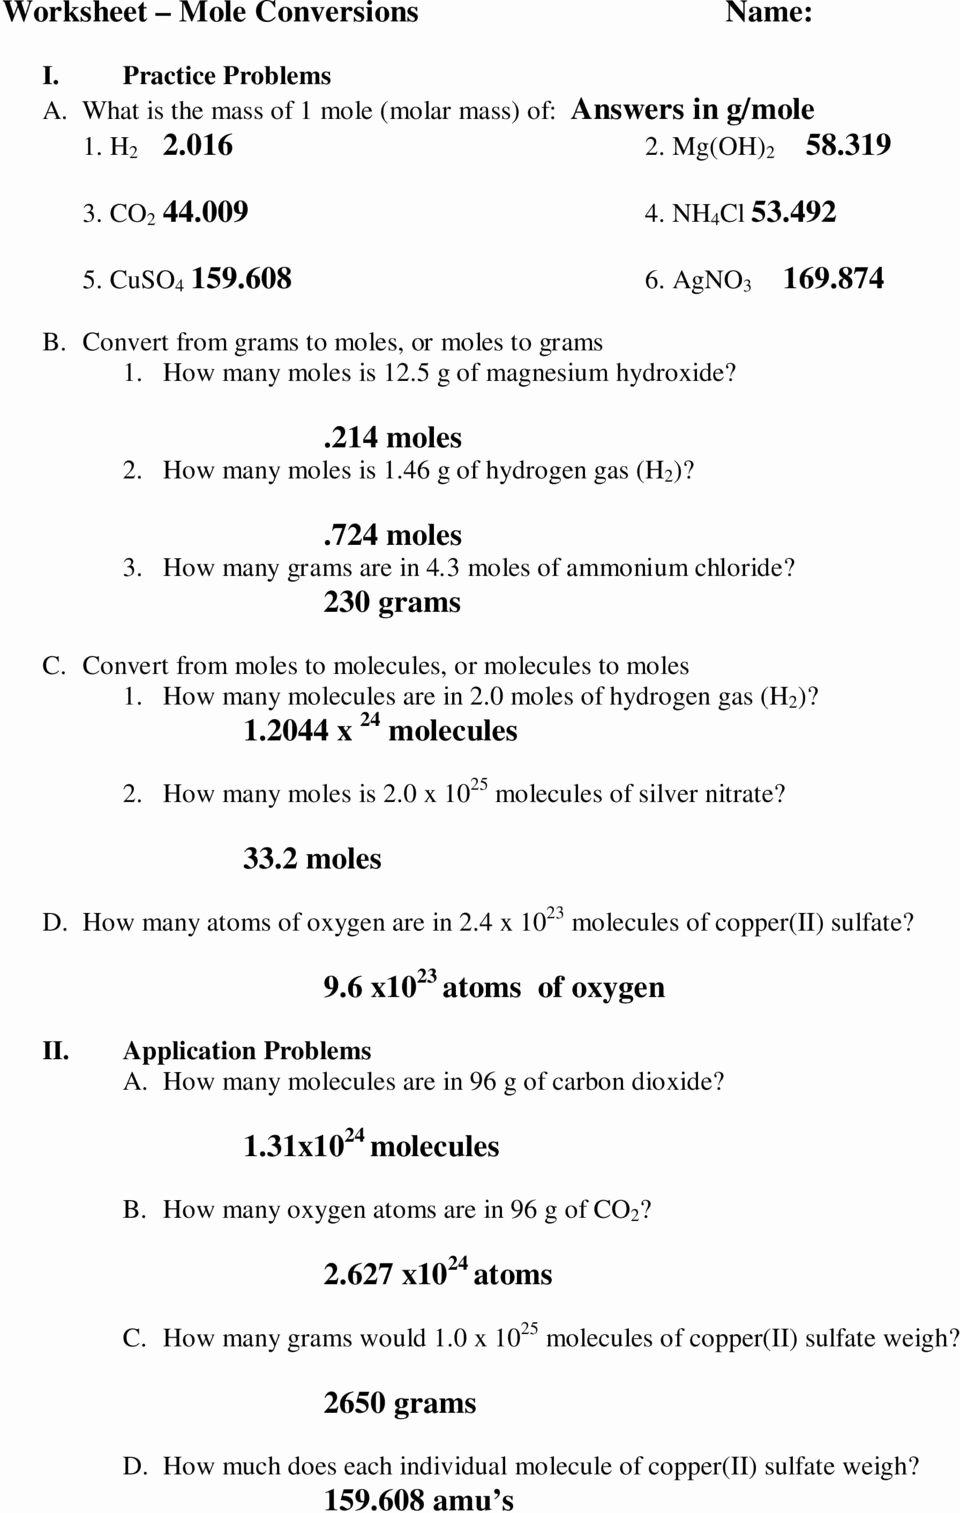 Worksheet Mole Problems Answers Elegant Ic 8 Mole Conversion Problems Worksheet Breadandhearth